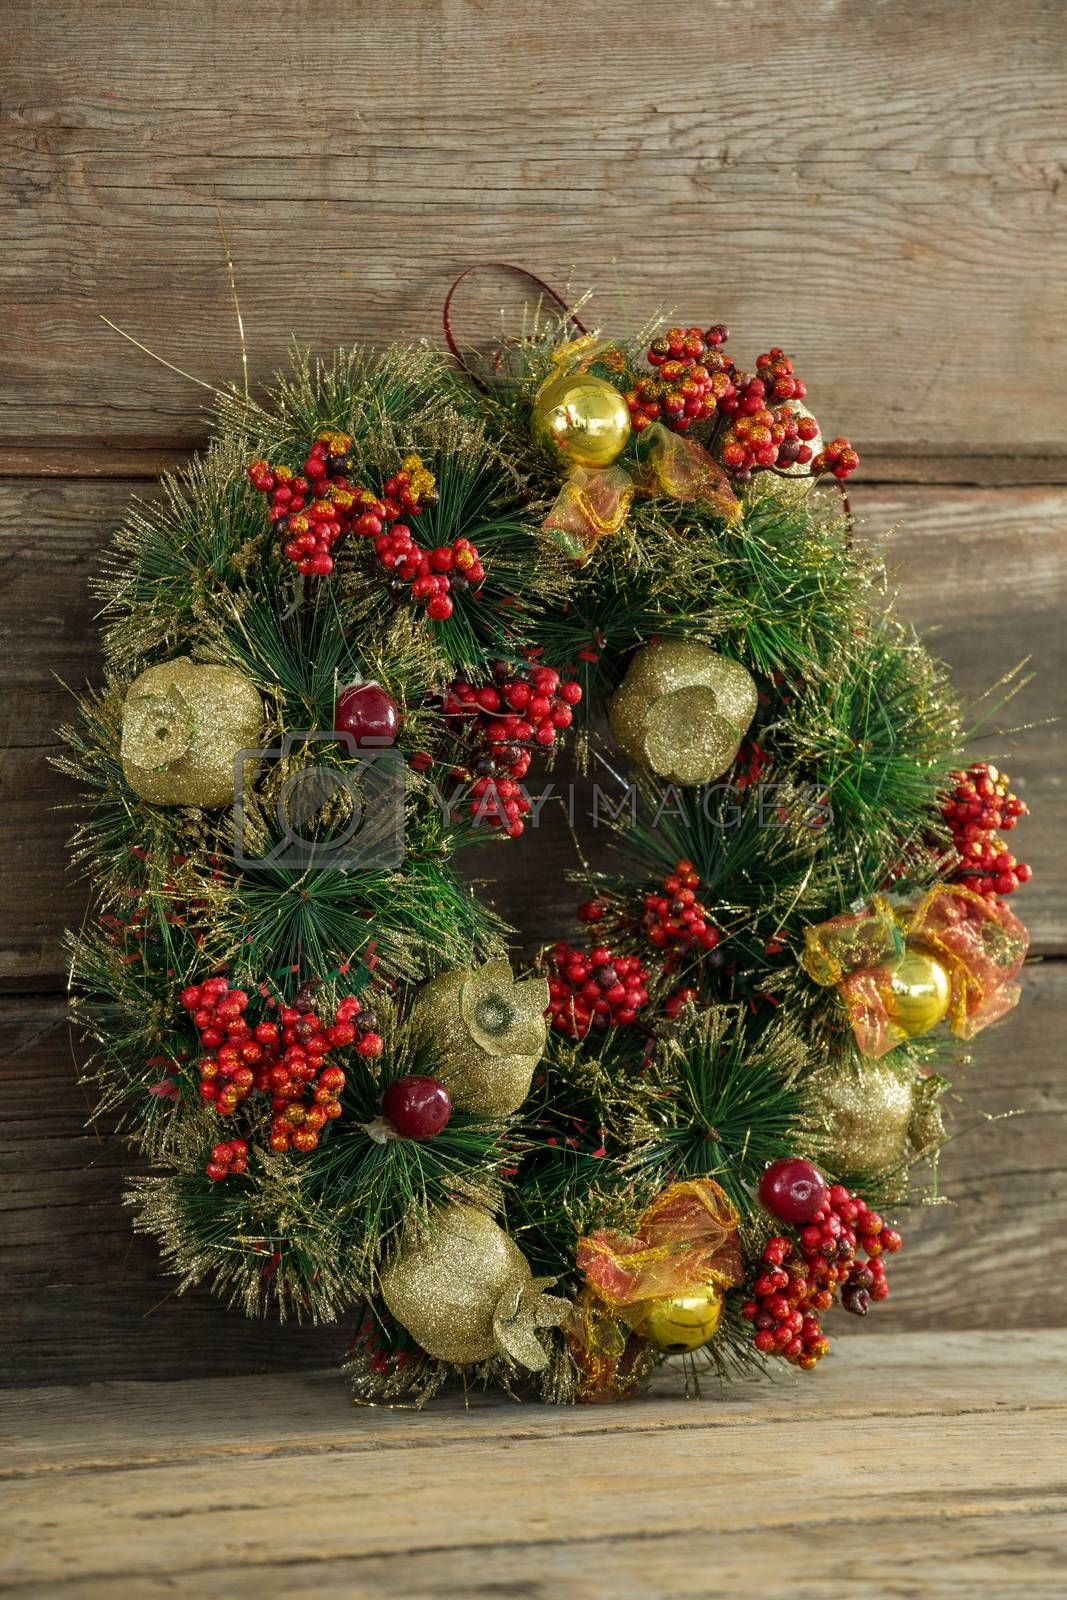 Christmas wreath against wooden background by Wavebreakmedia